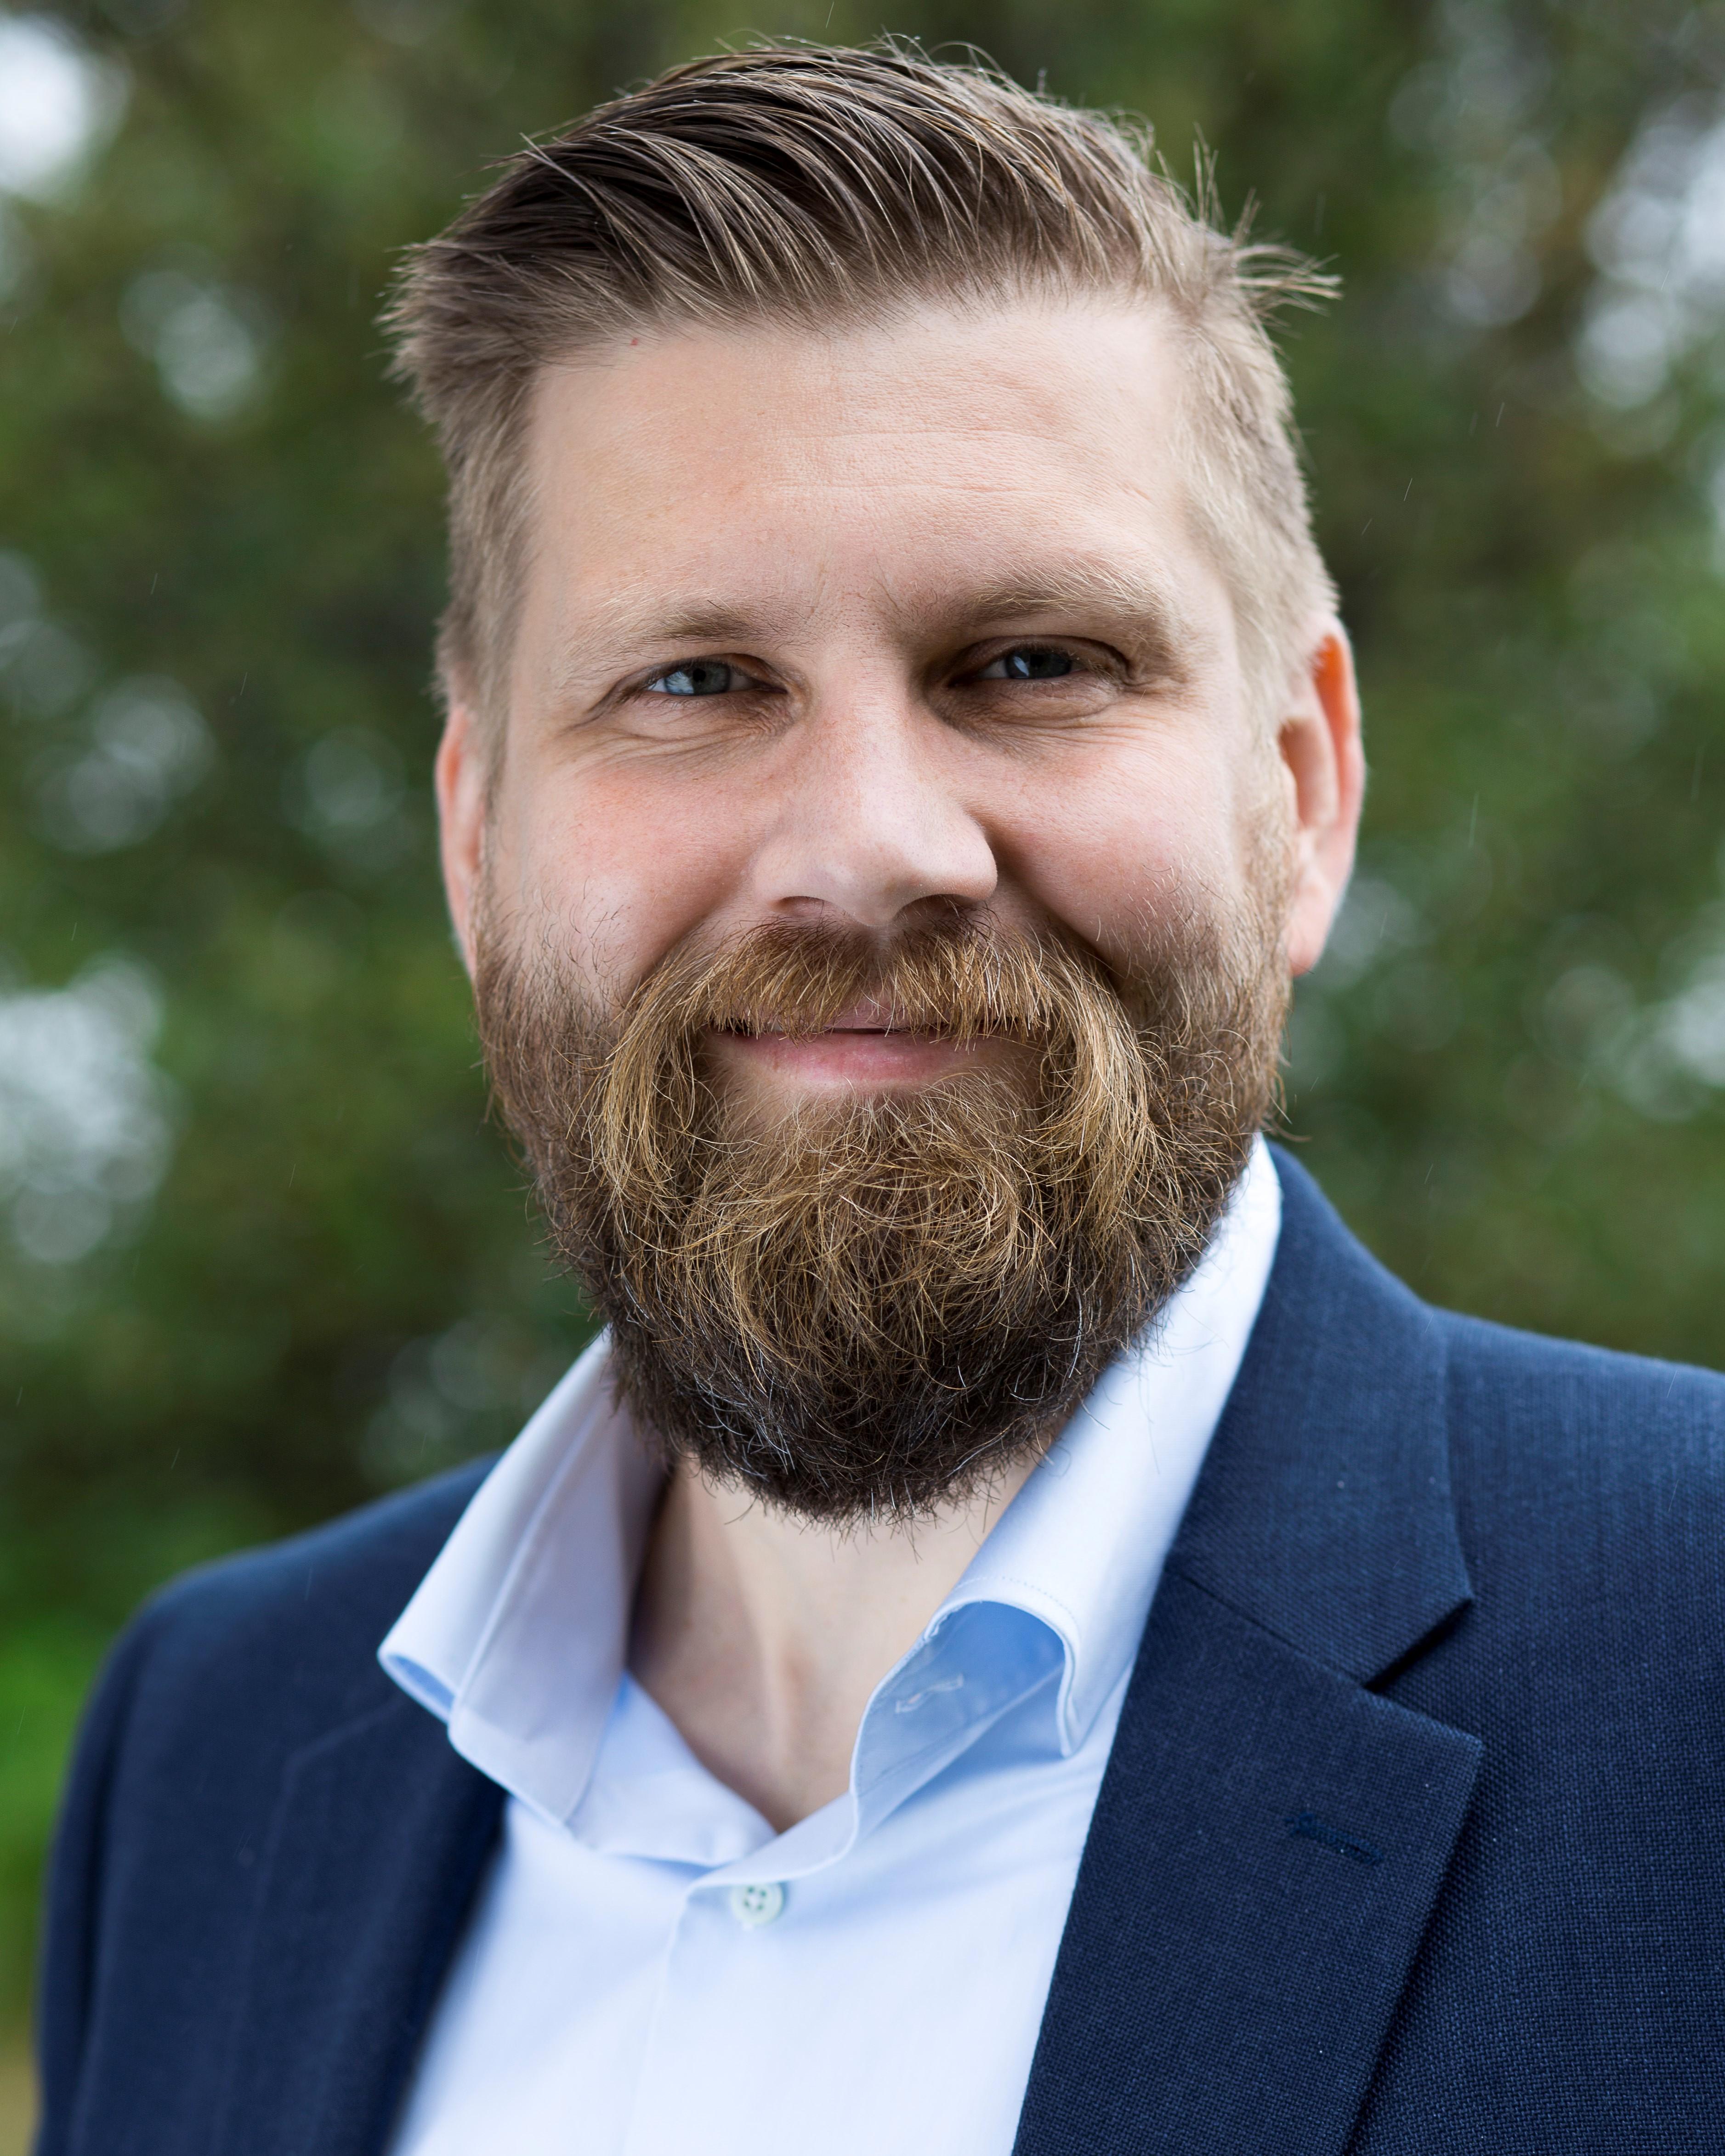 Johannes Gudmundsson